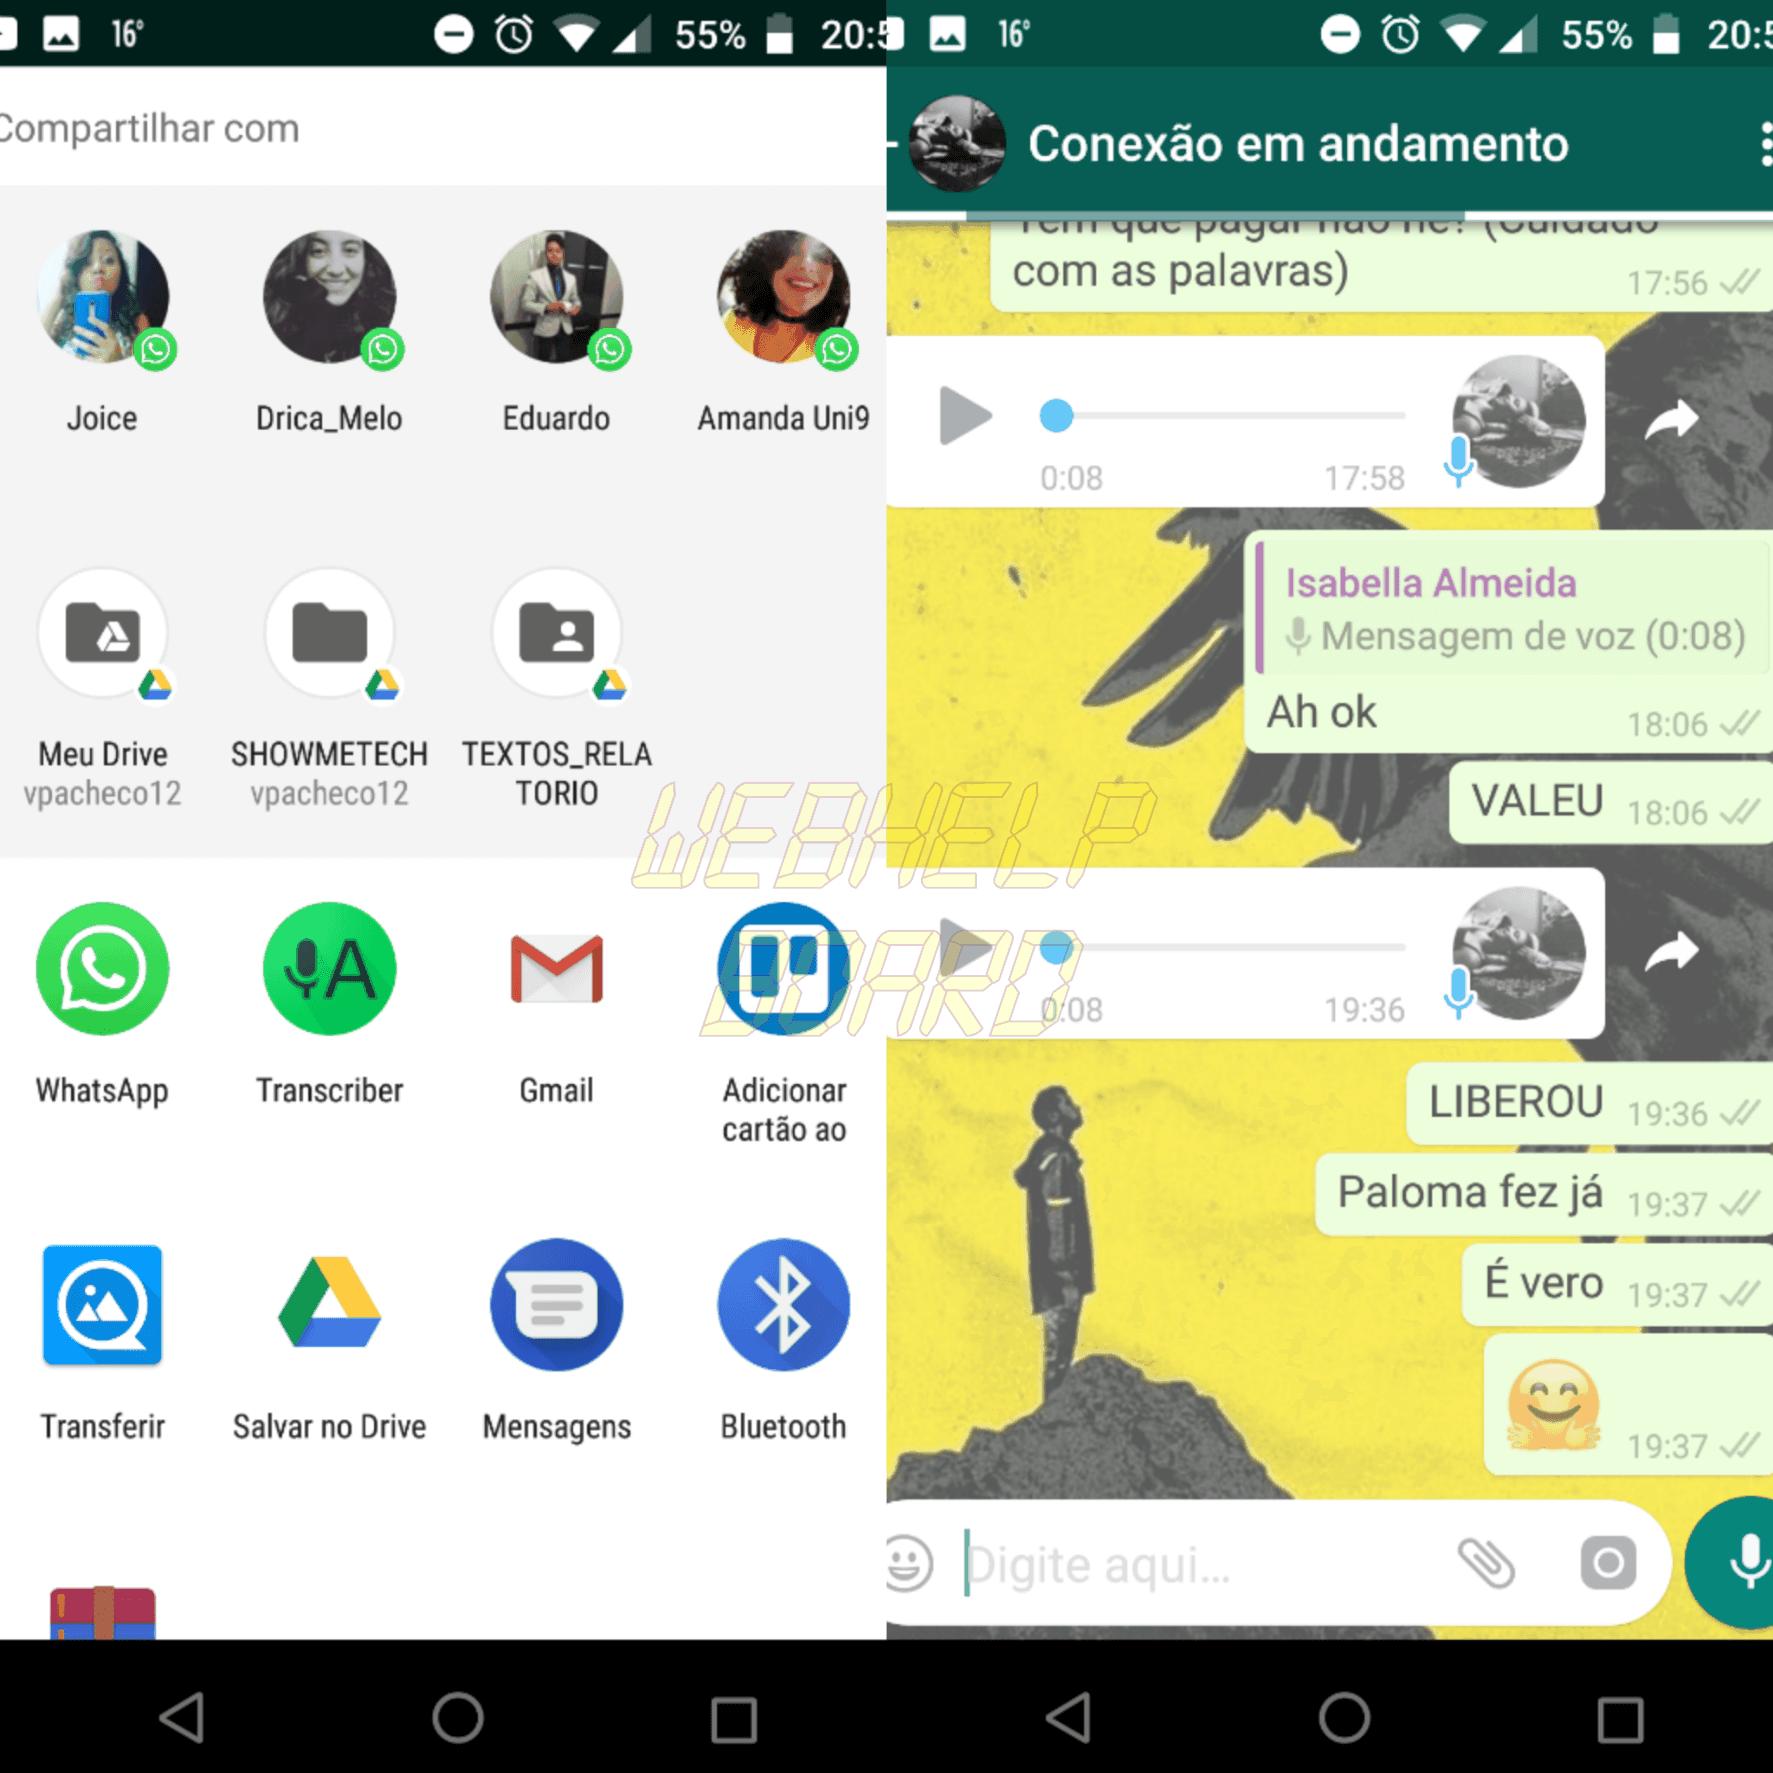 PicsArt 07 13 09.09.10 - WhatsApp: saiba como converter as mensagens de áudio para texto